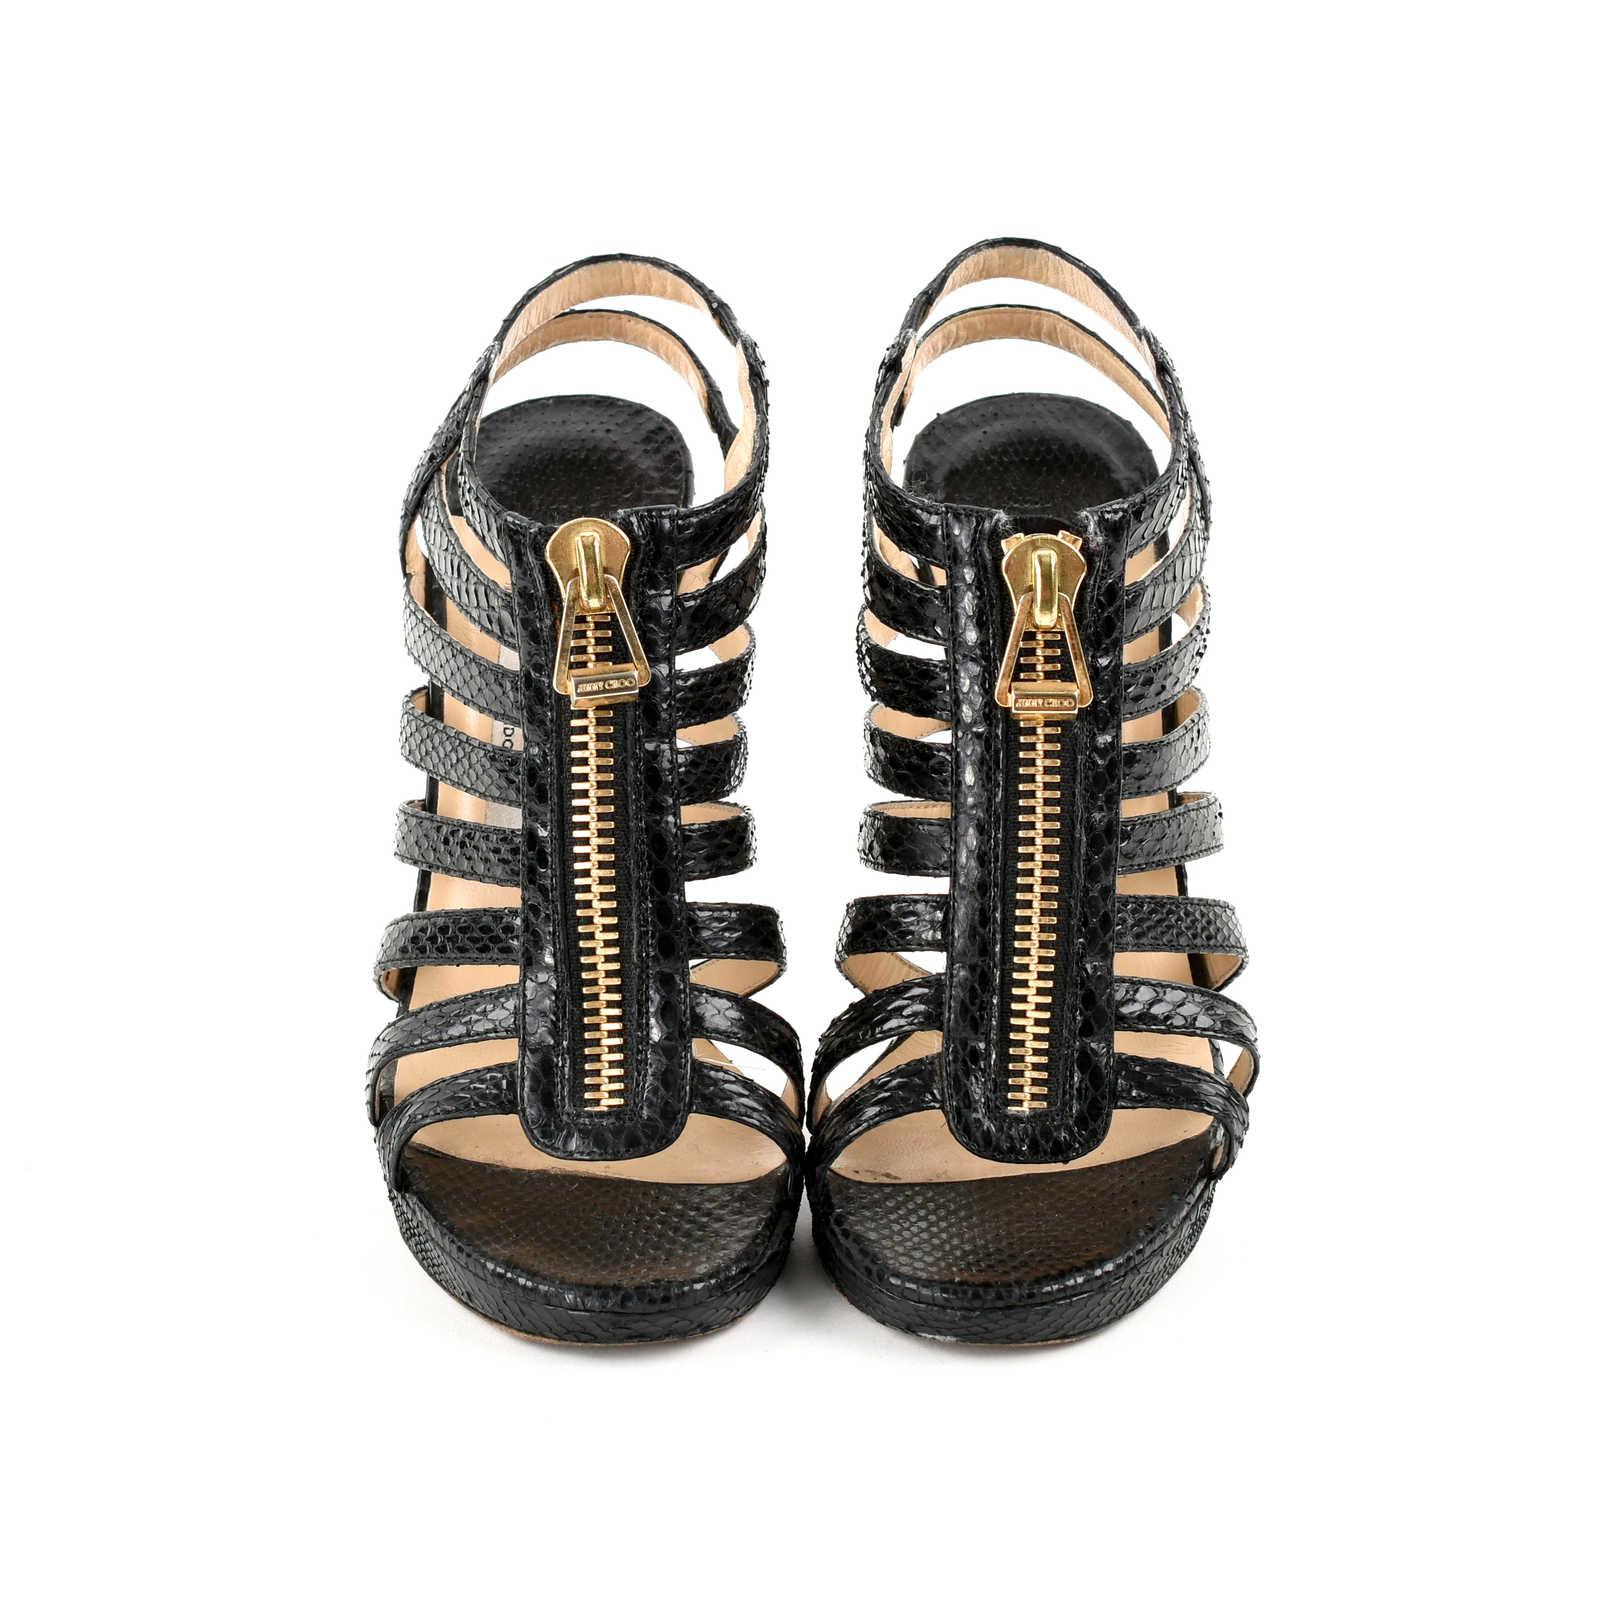 388d4b4b9c7c9 ... Jimmy Choo Glenys Snakeskin Sandals Black - Thumbnail 0 .